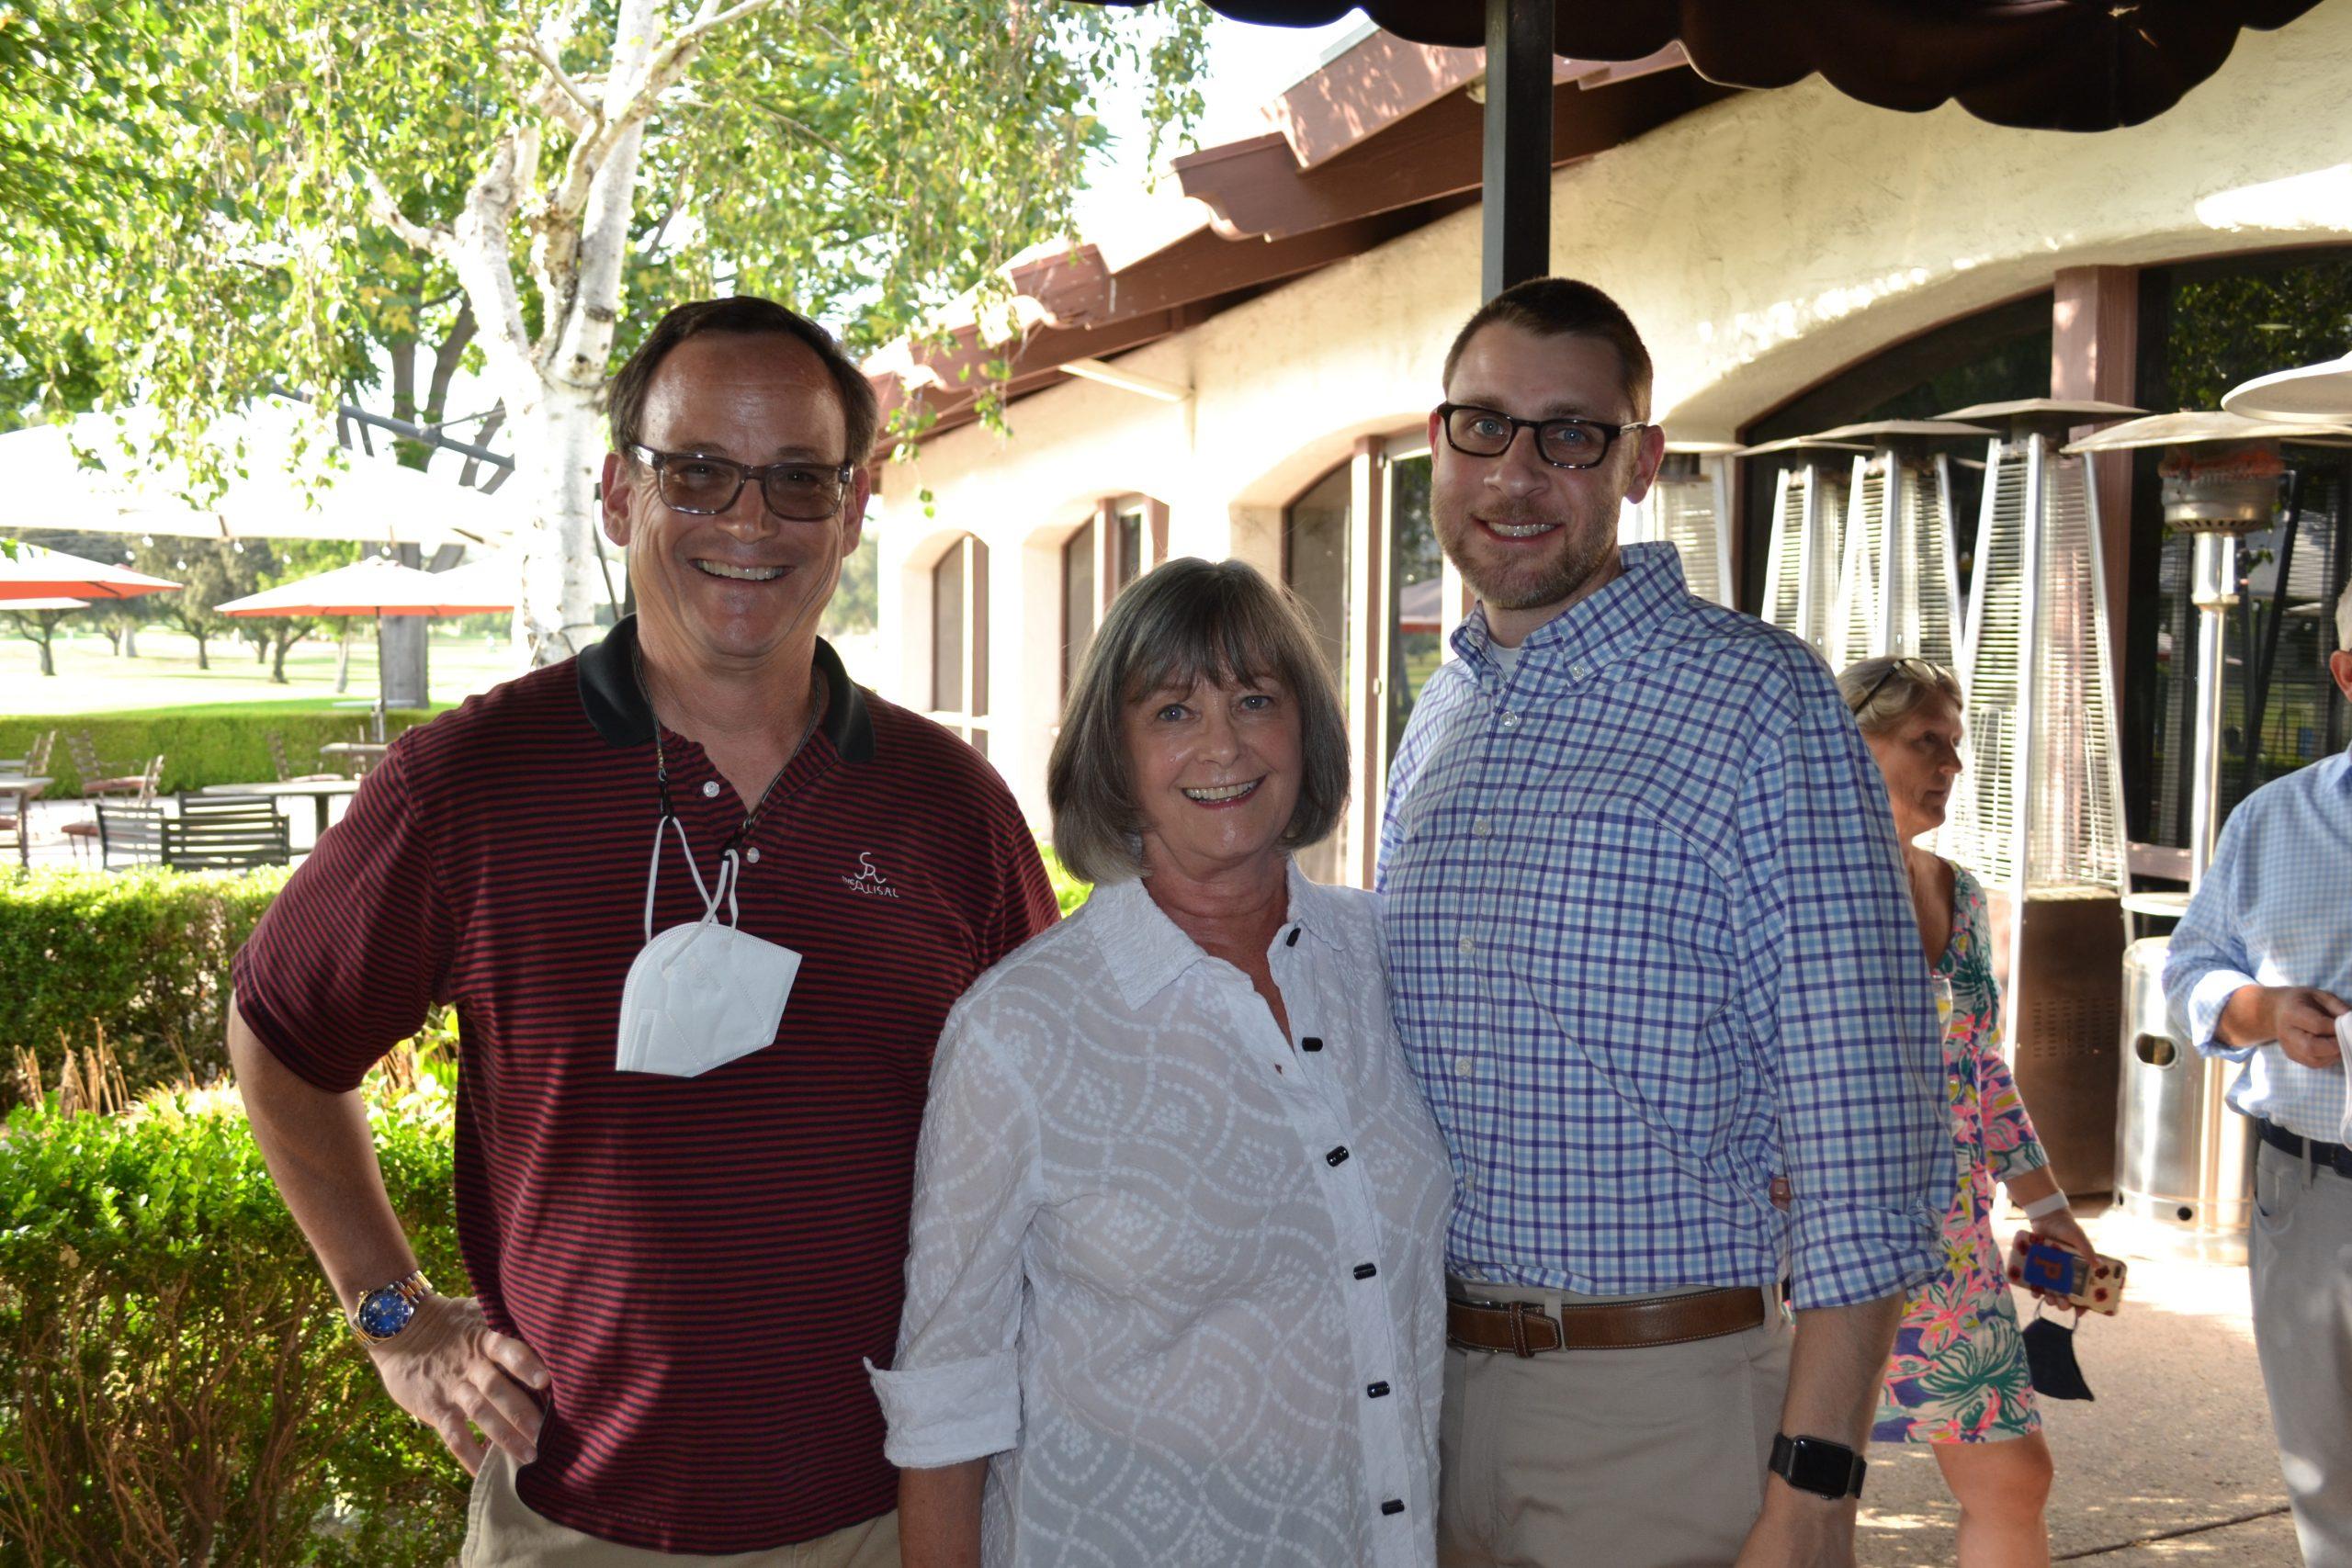 Civias -Andy Wilson, Margaret McAustin and James De Pietro 0197